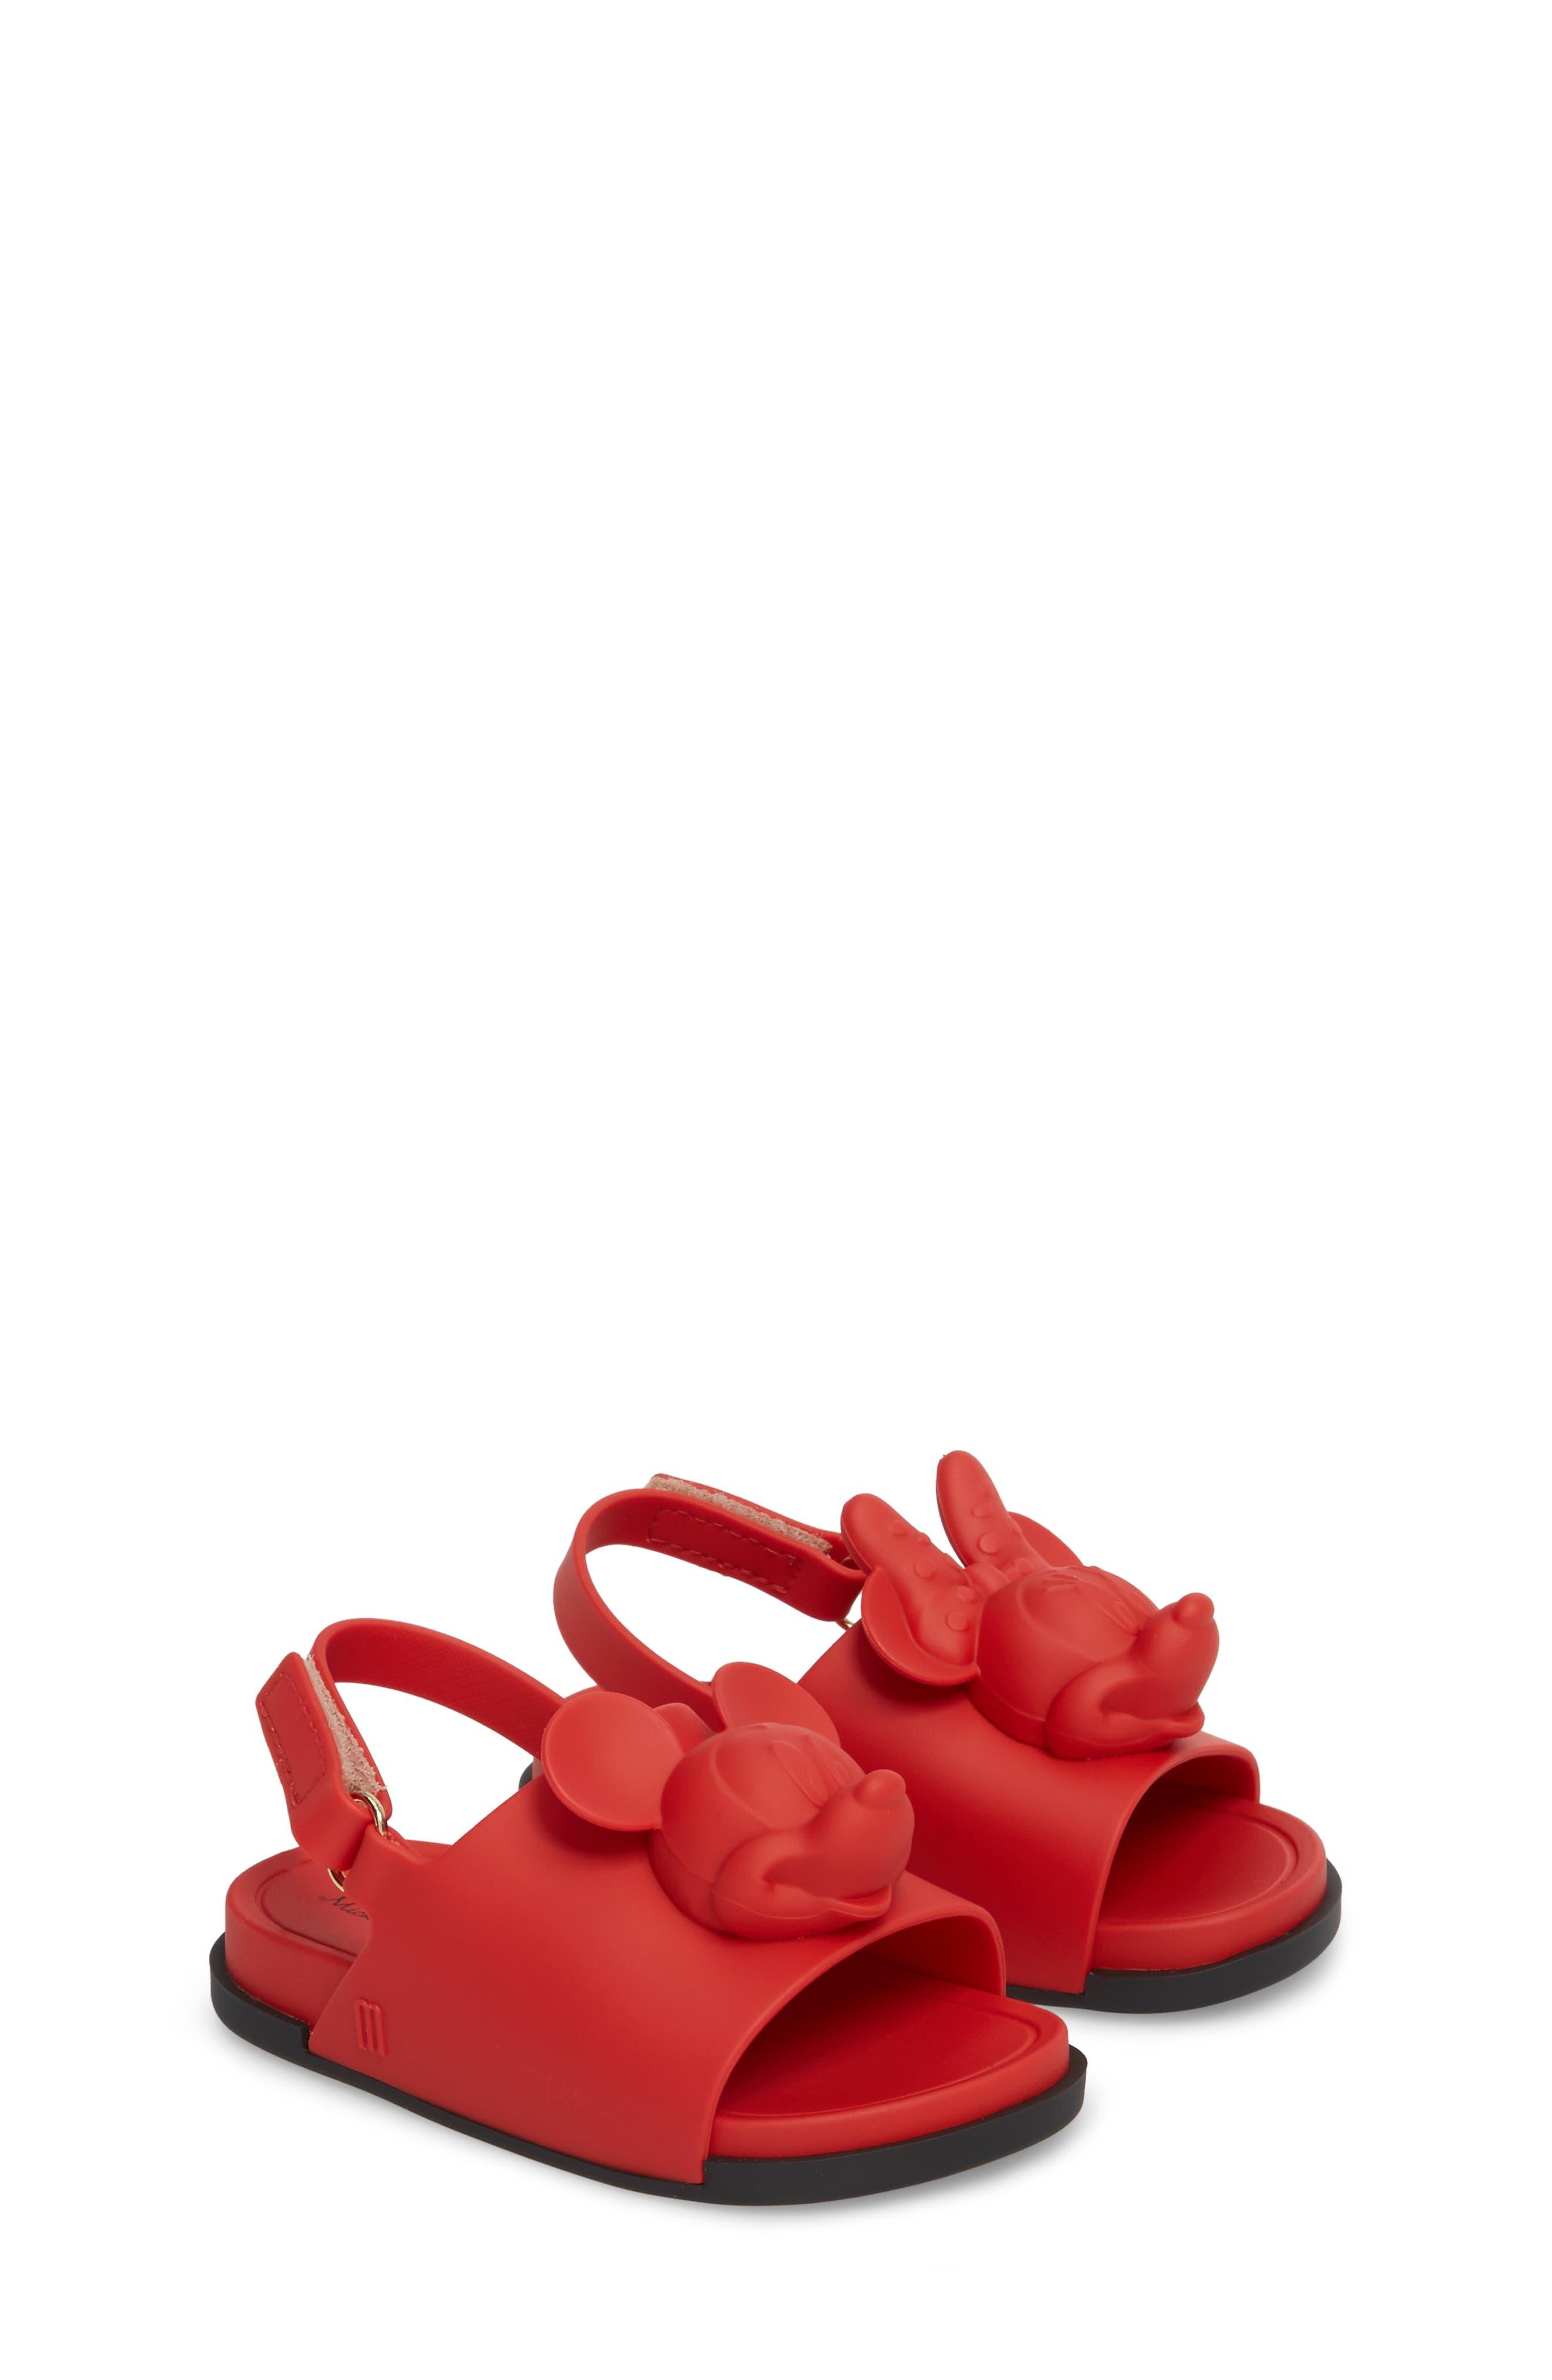 Disney<sup>®</sup> Mini Beach Sandal,                             Alternate thumbnail 7, color,